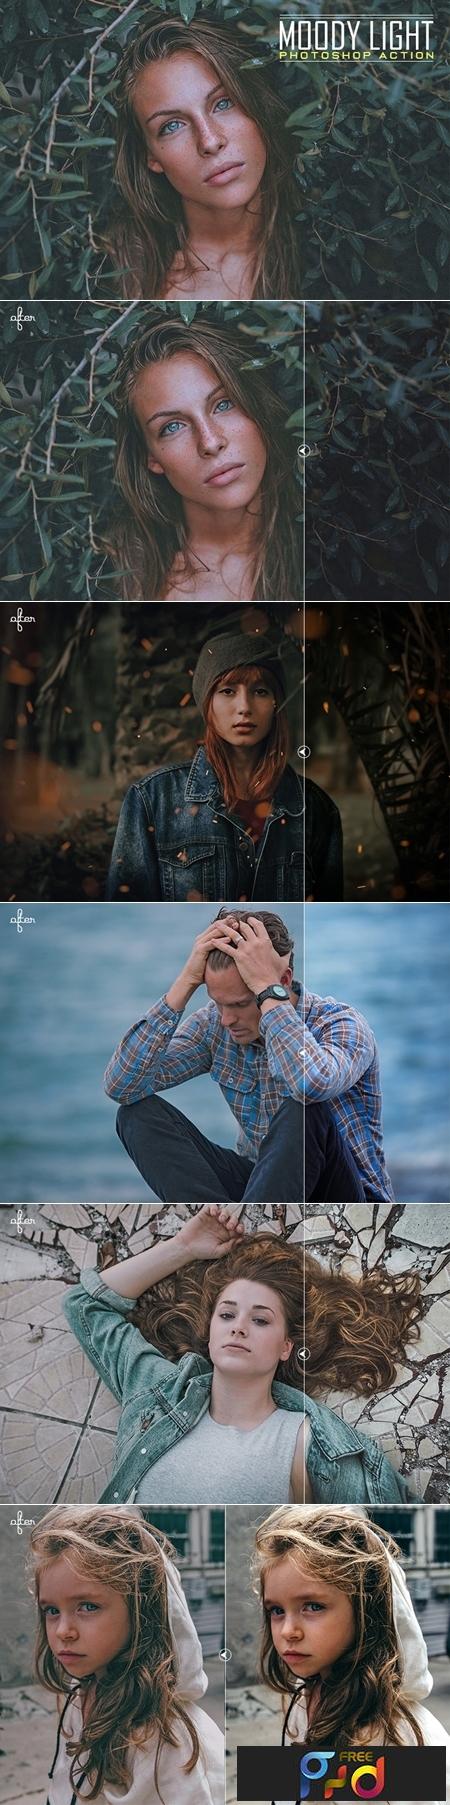 Moody Light Photoshop Action 1